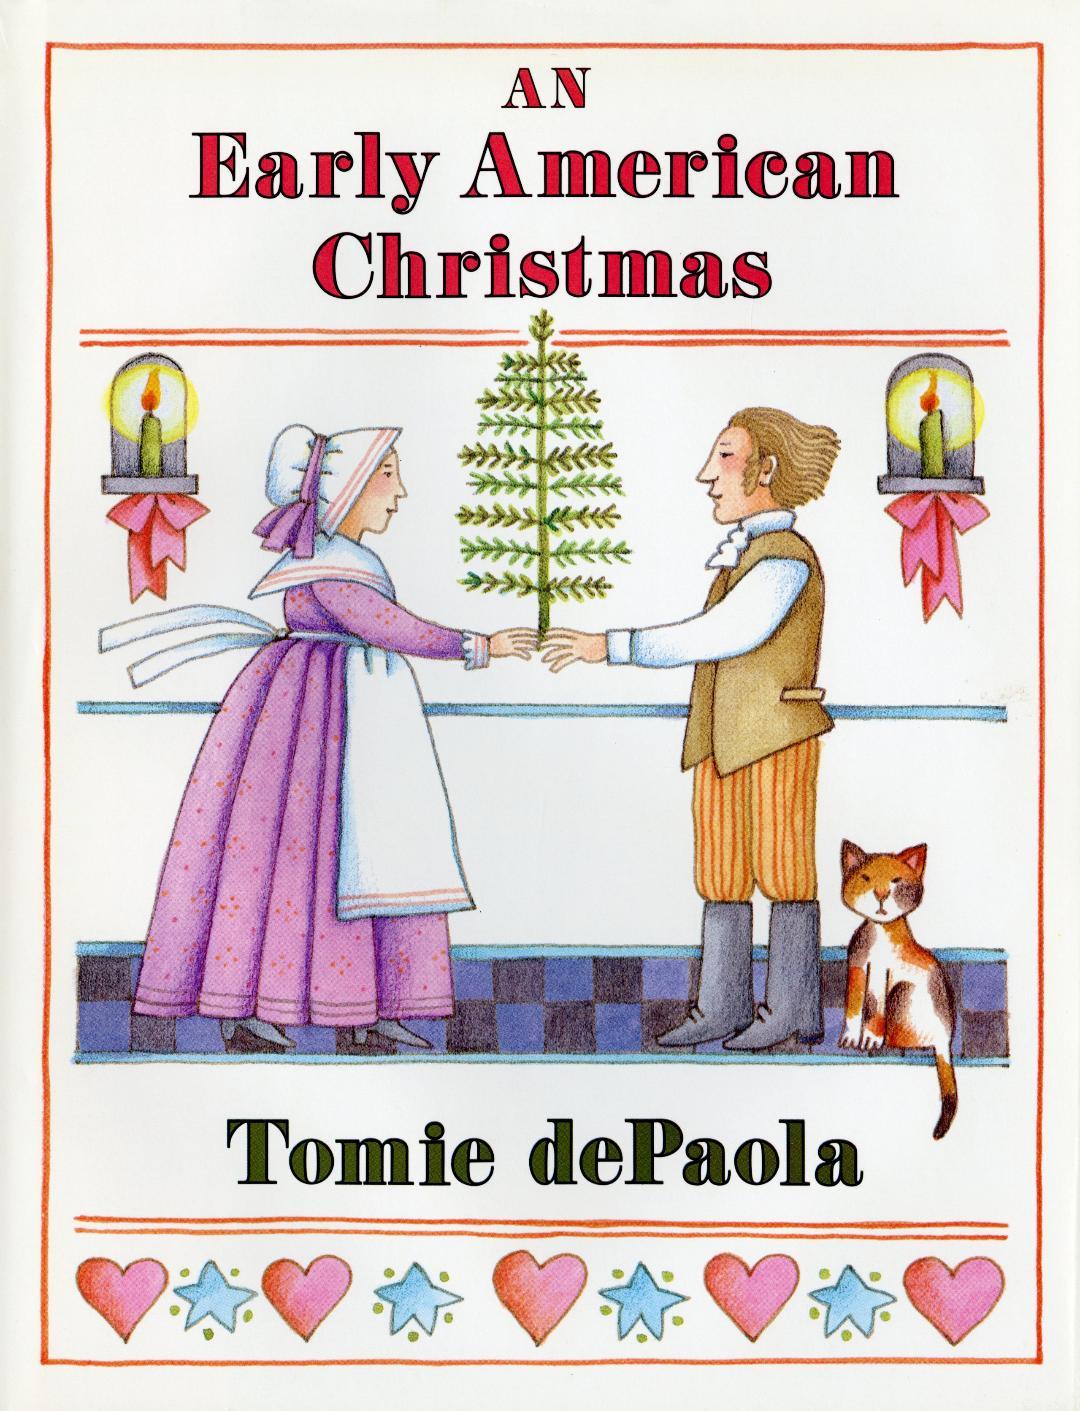 Early American Christmas, An HC.jpg